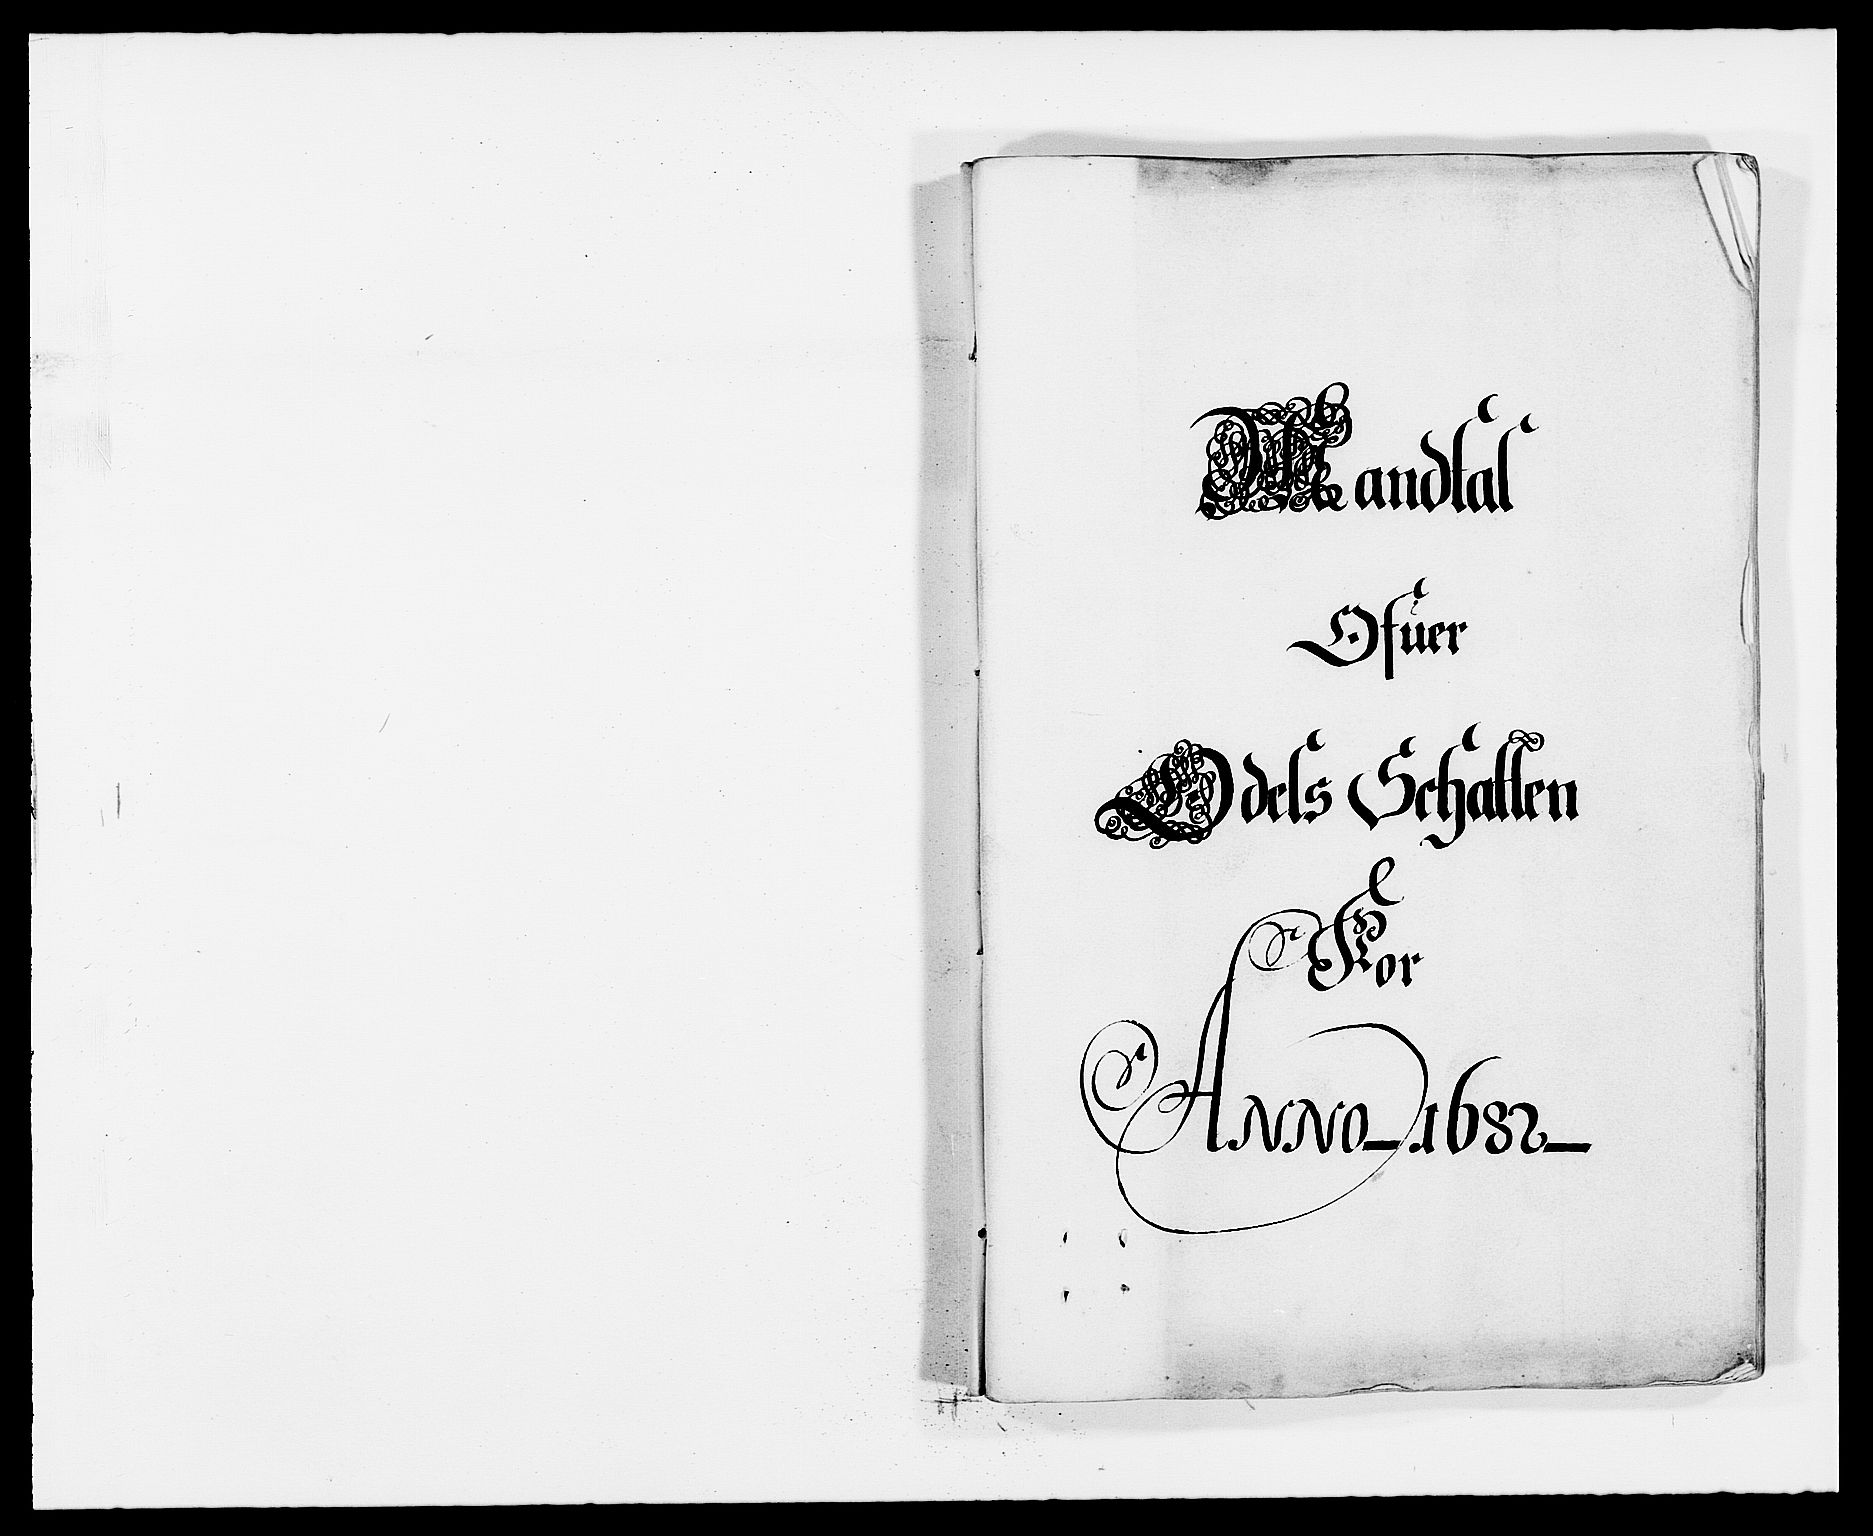 RA, Rentekammeret inntil 1814, Reviderte regnskaper, Fogderegnskap, R32/L1851: Fogderegnskap Jarlsberg grevskap, 1682, s. 220